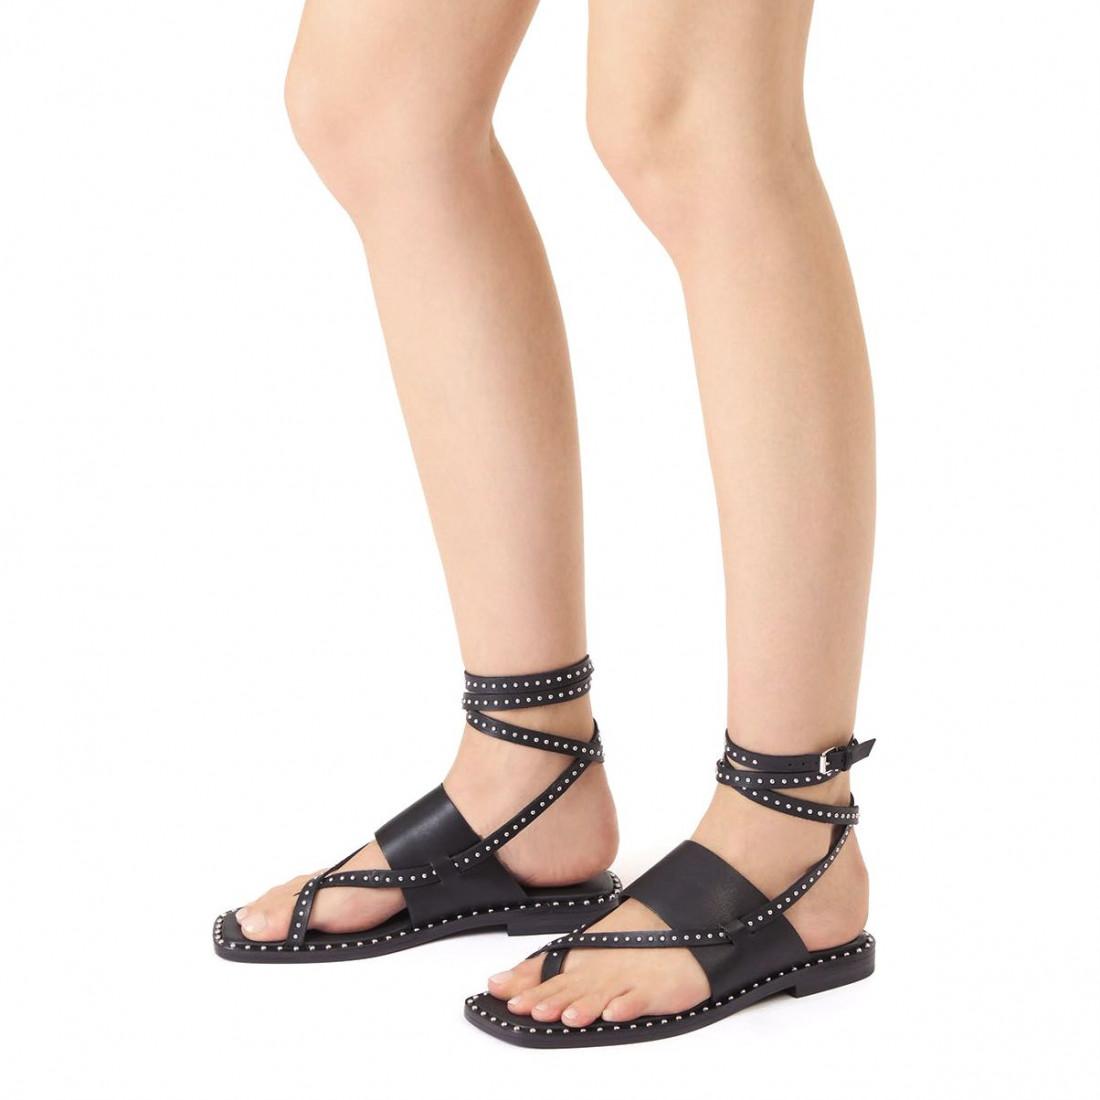 sandals woman ash medusastud01 8656